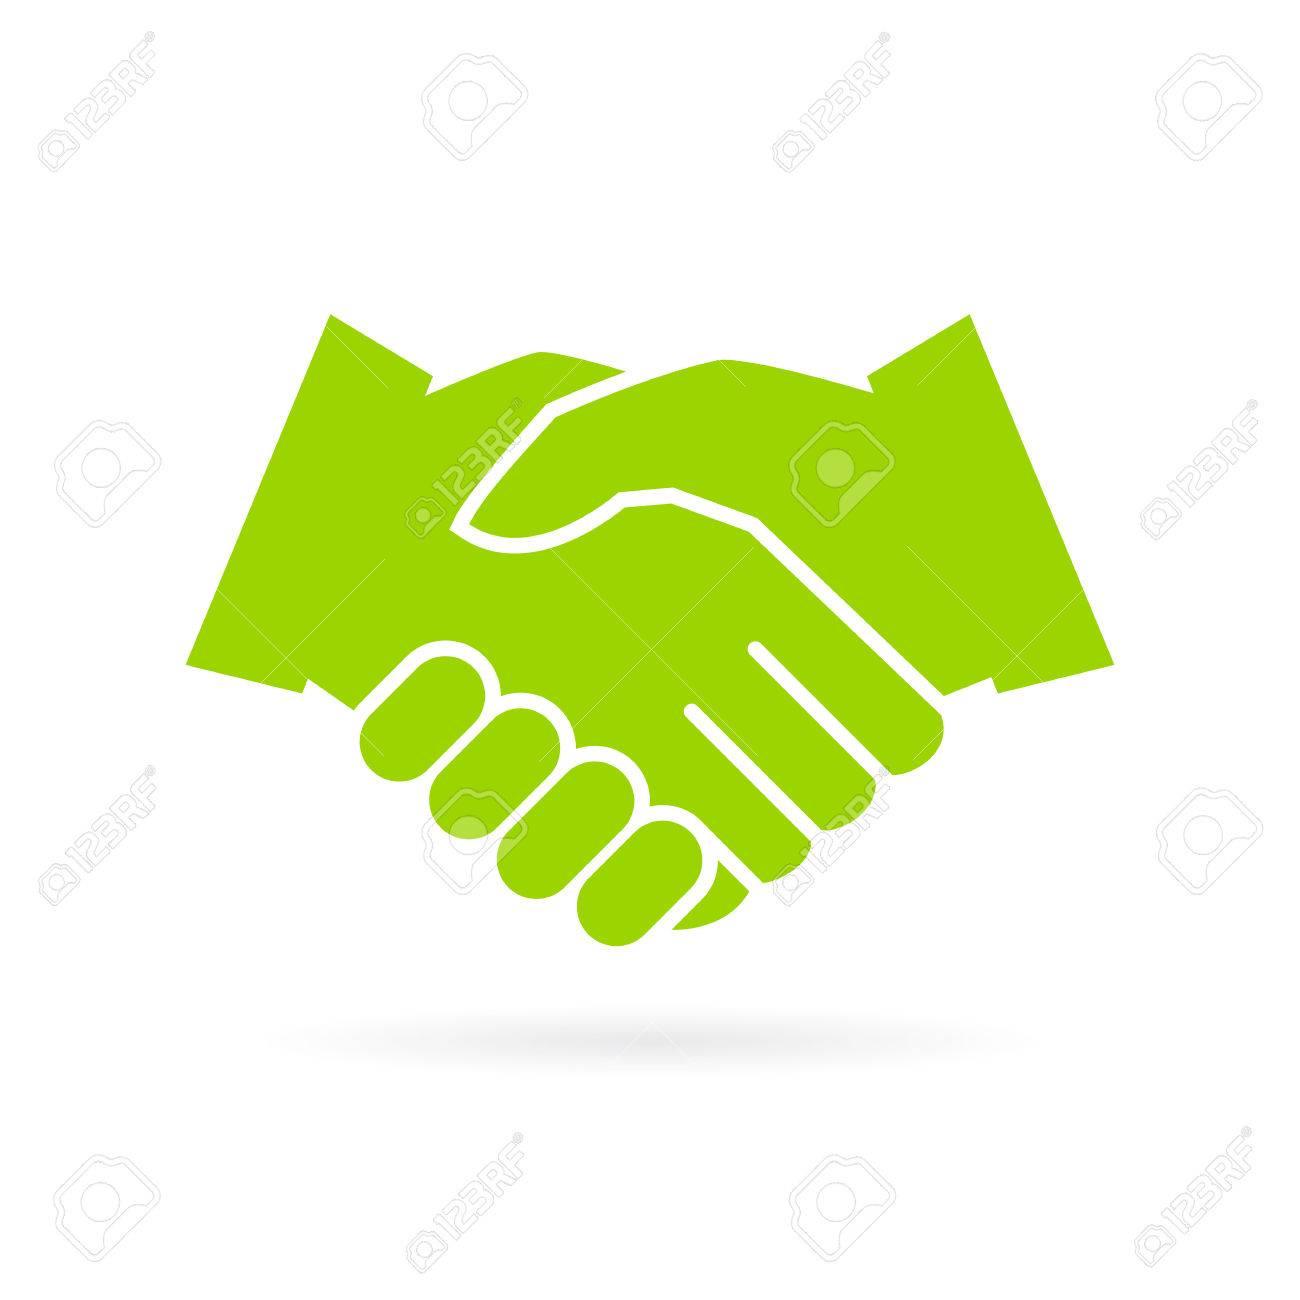 Hand shake vector icon - 69149880